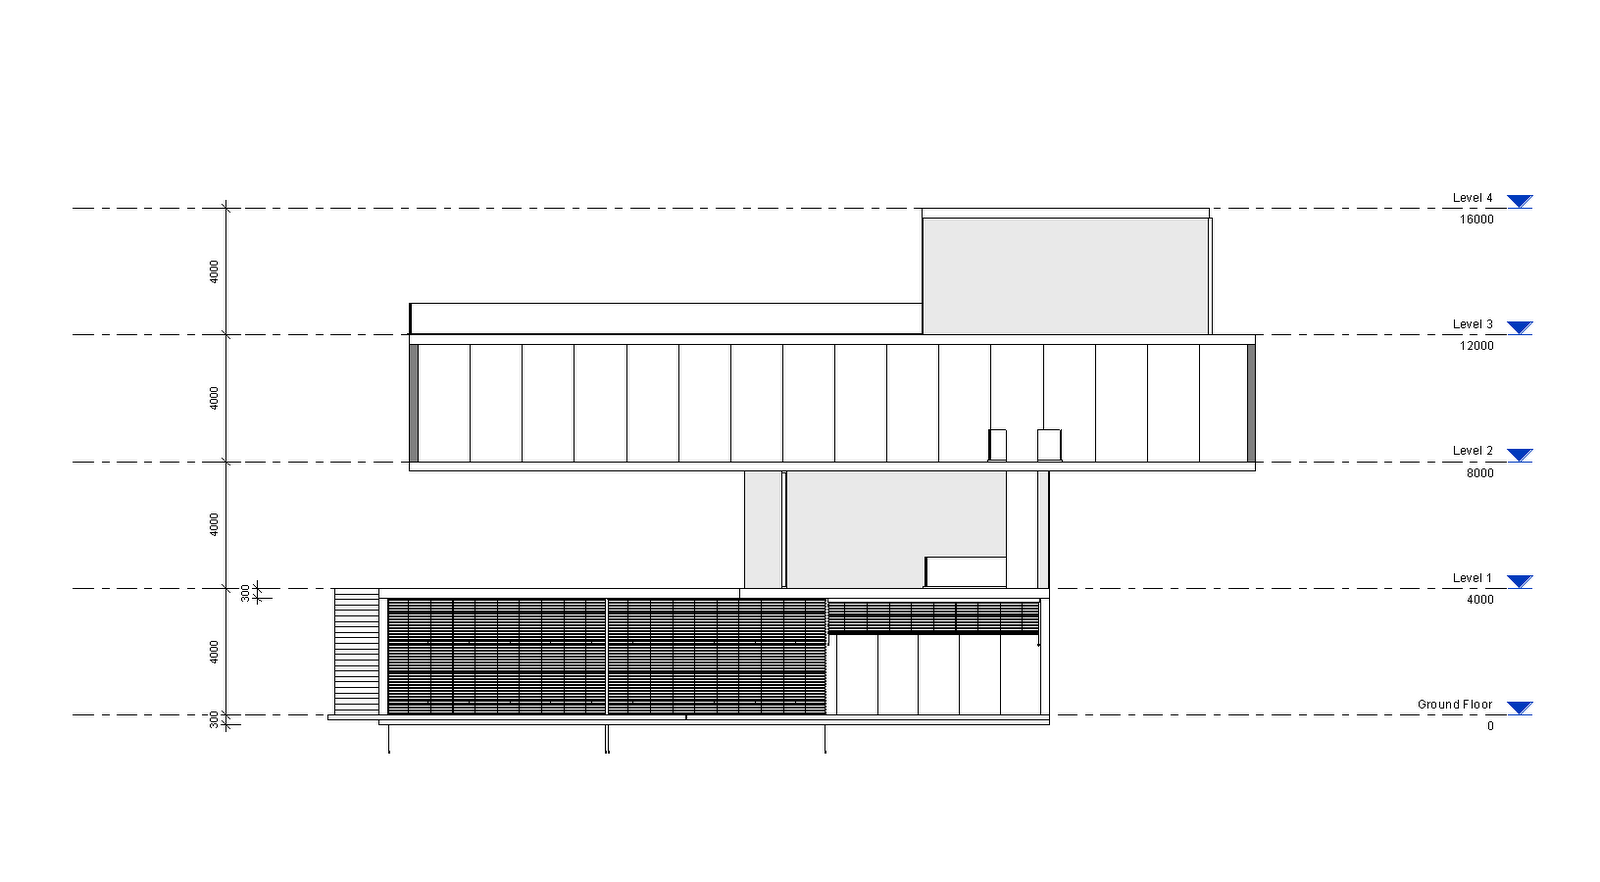 Third Floor Elevation : Salli hanninen arch week drawing documentation